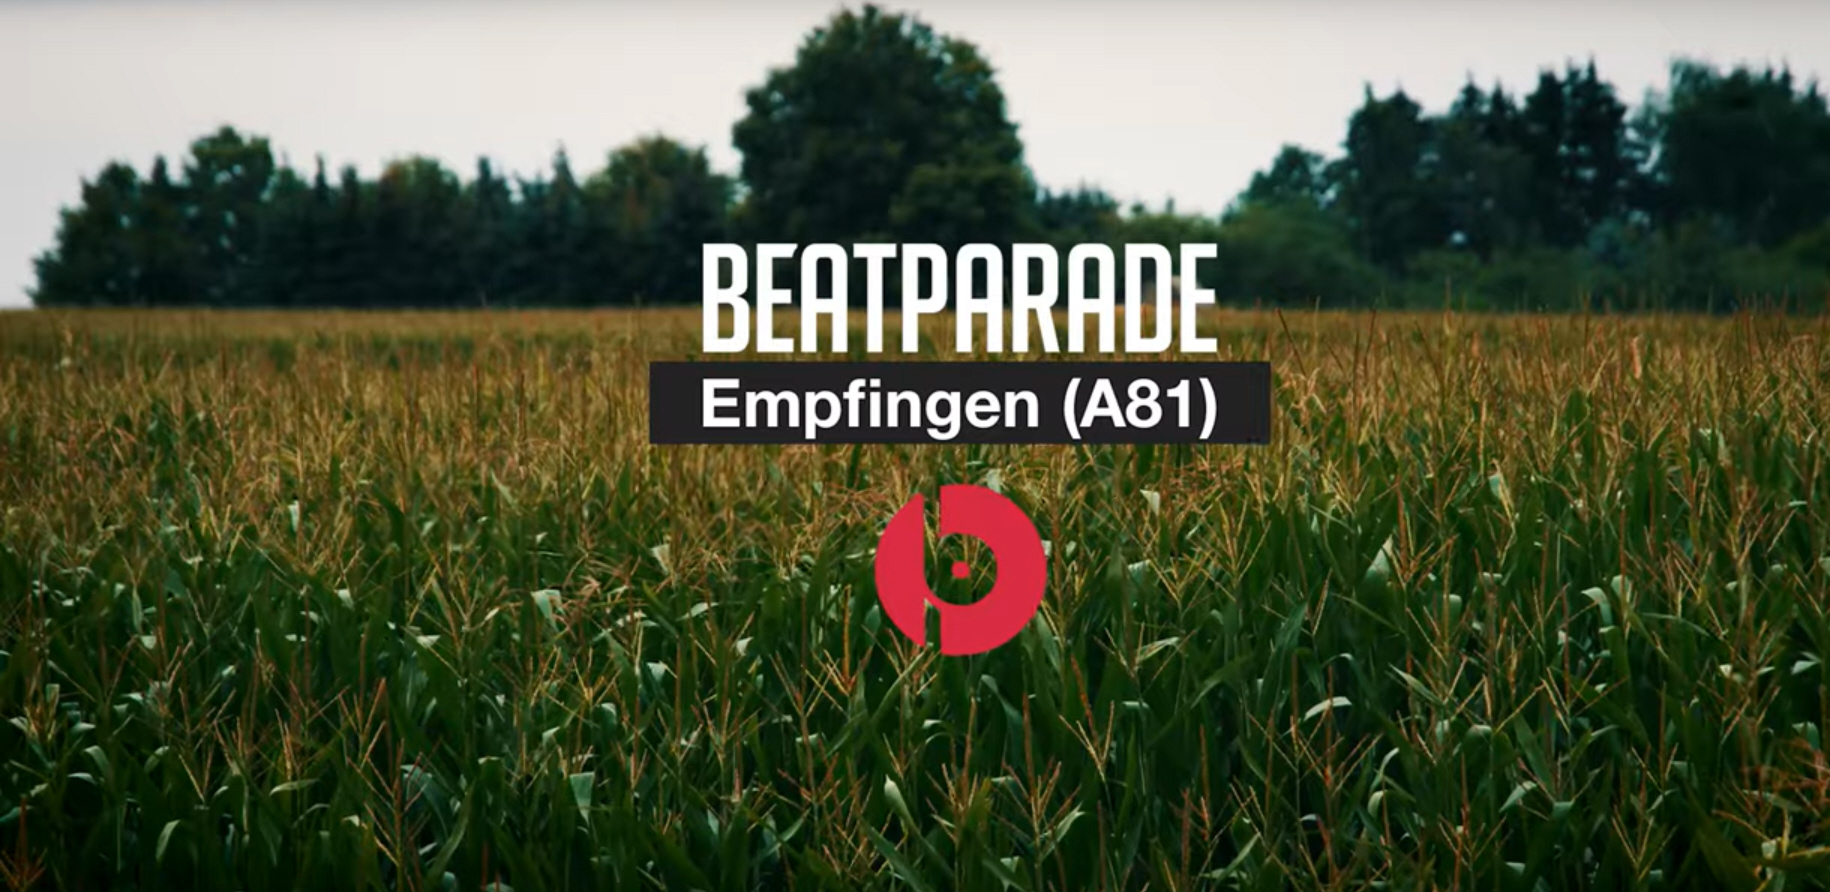 BEATPARADE 2019 - Official Teaser